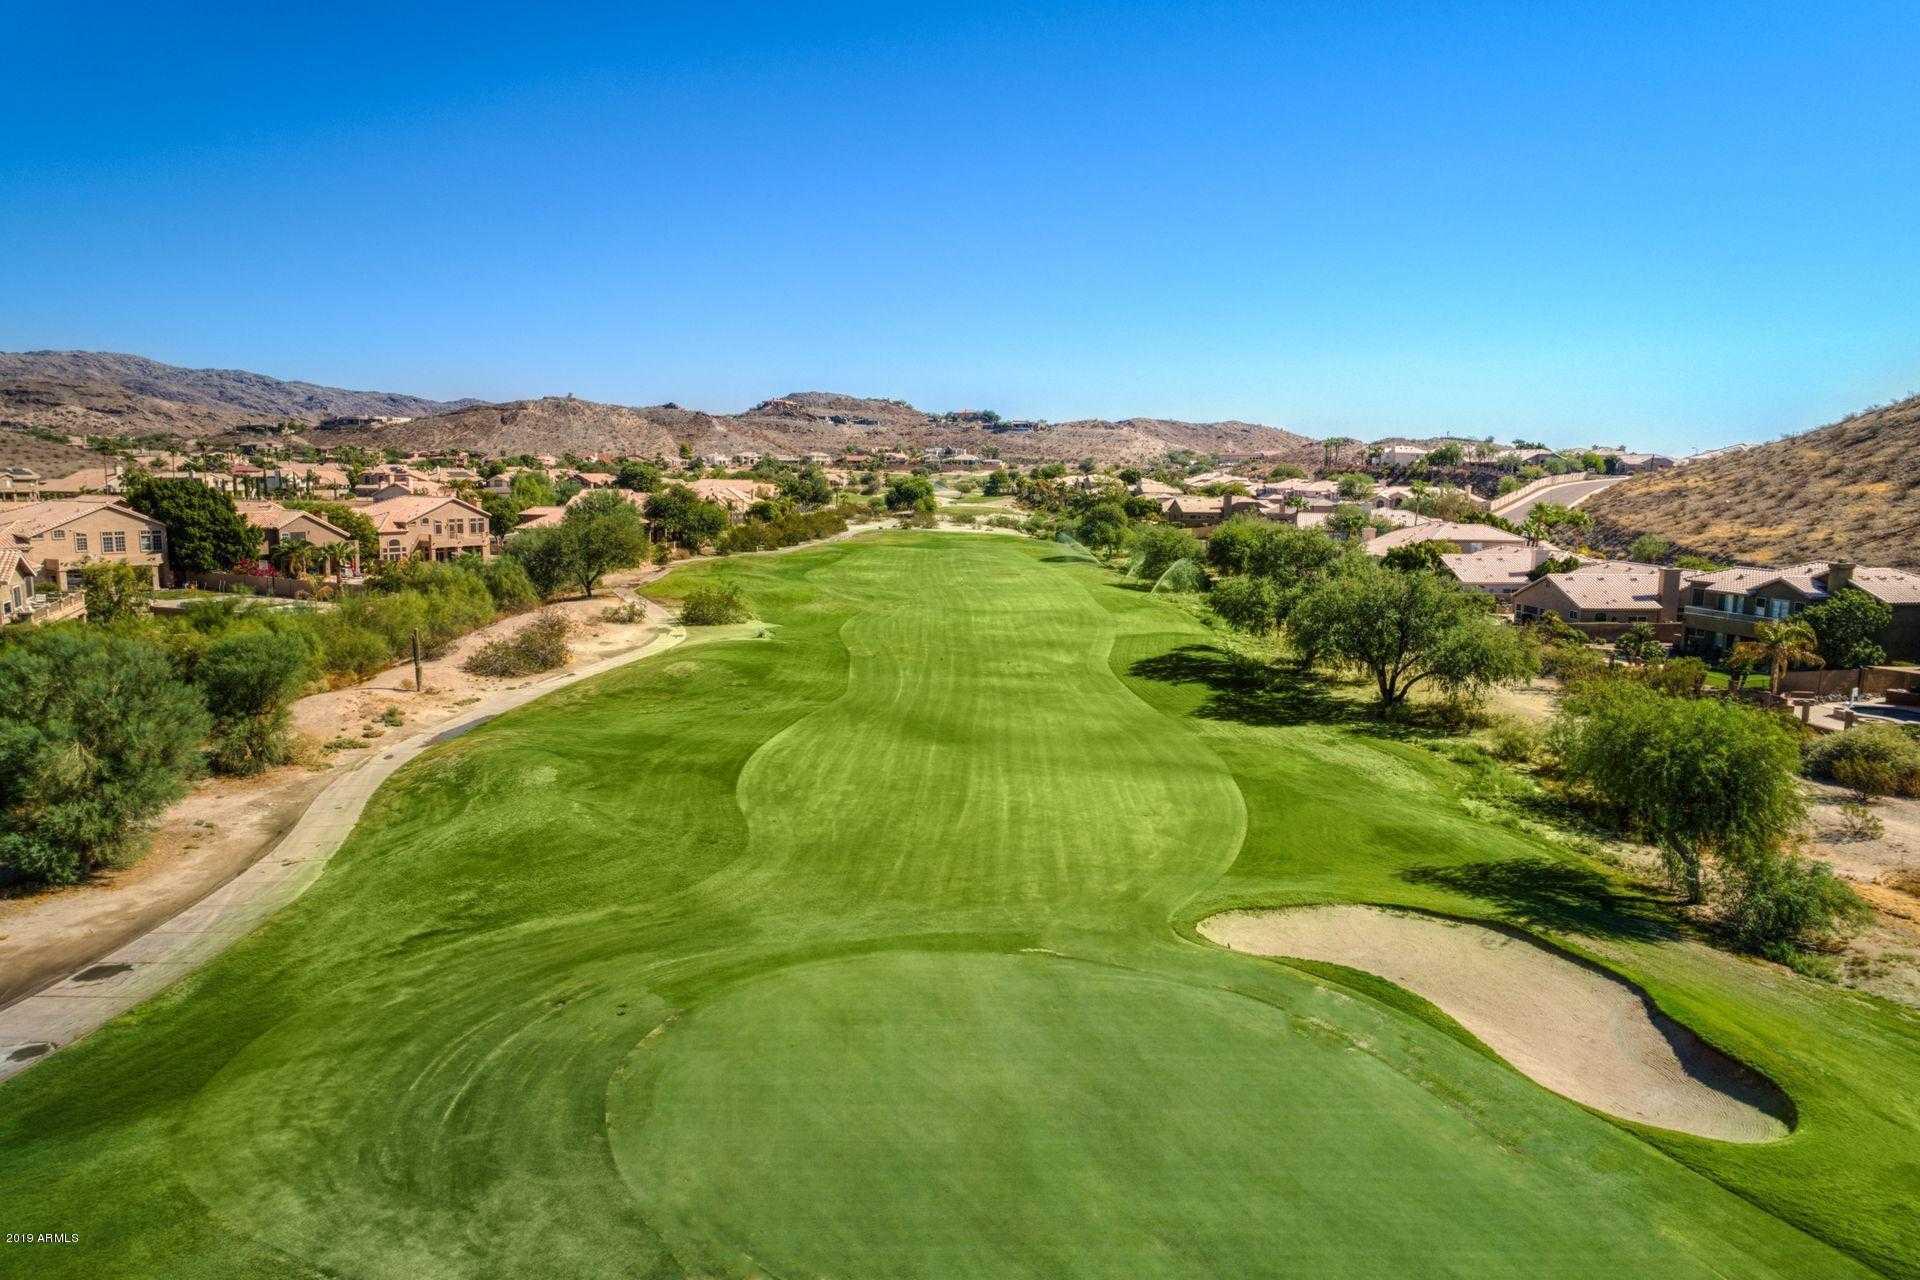 $374,900 - 4Br/3Ba - Home for Sale in Foothills Parcel 05c Lot 1-74 Tr A-e, Phoenix